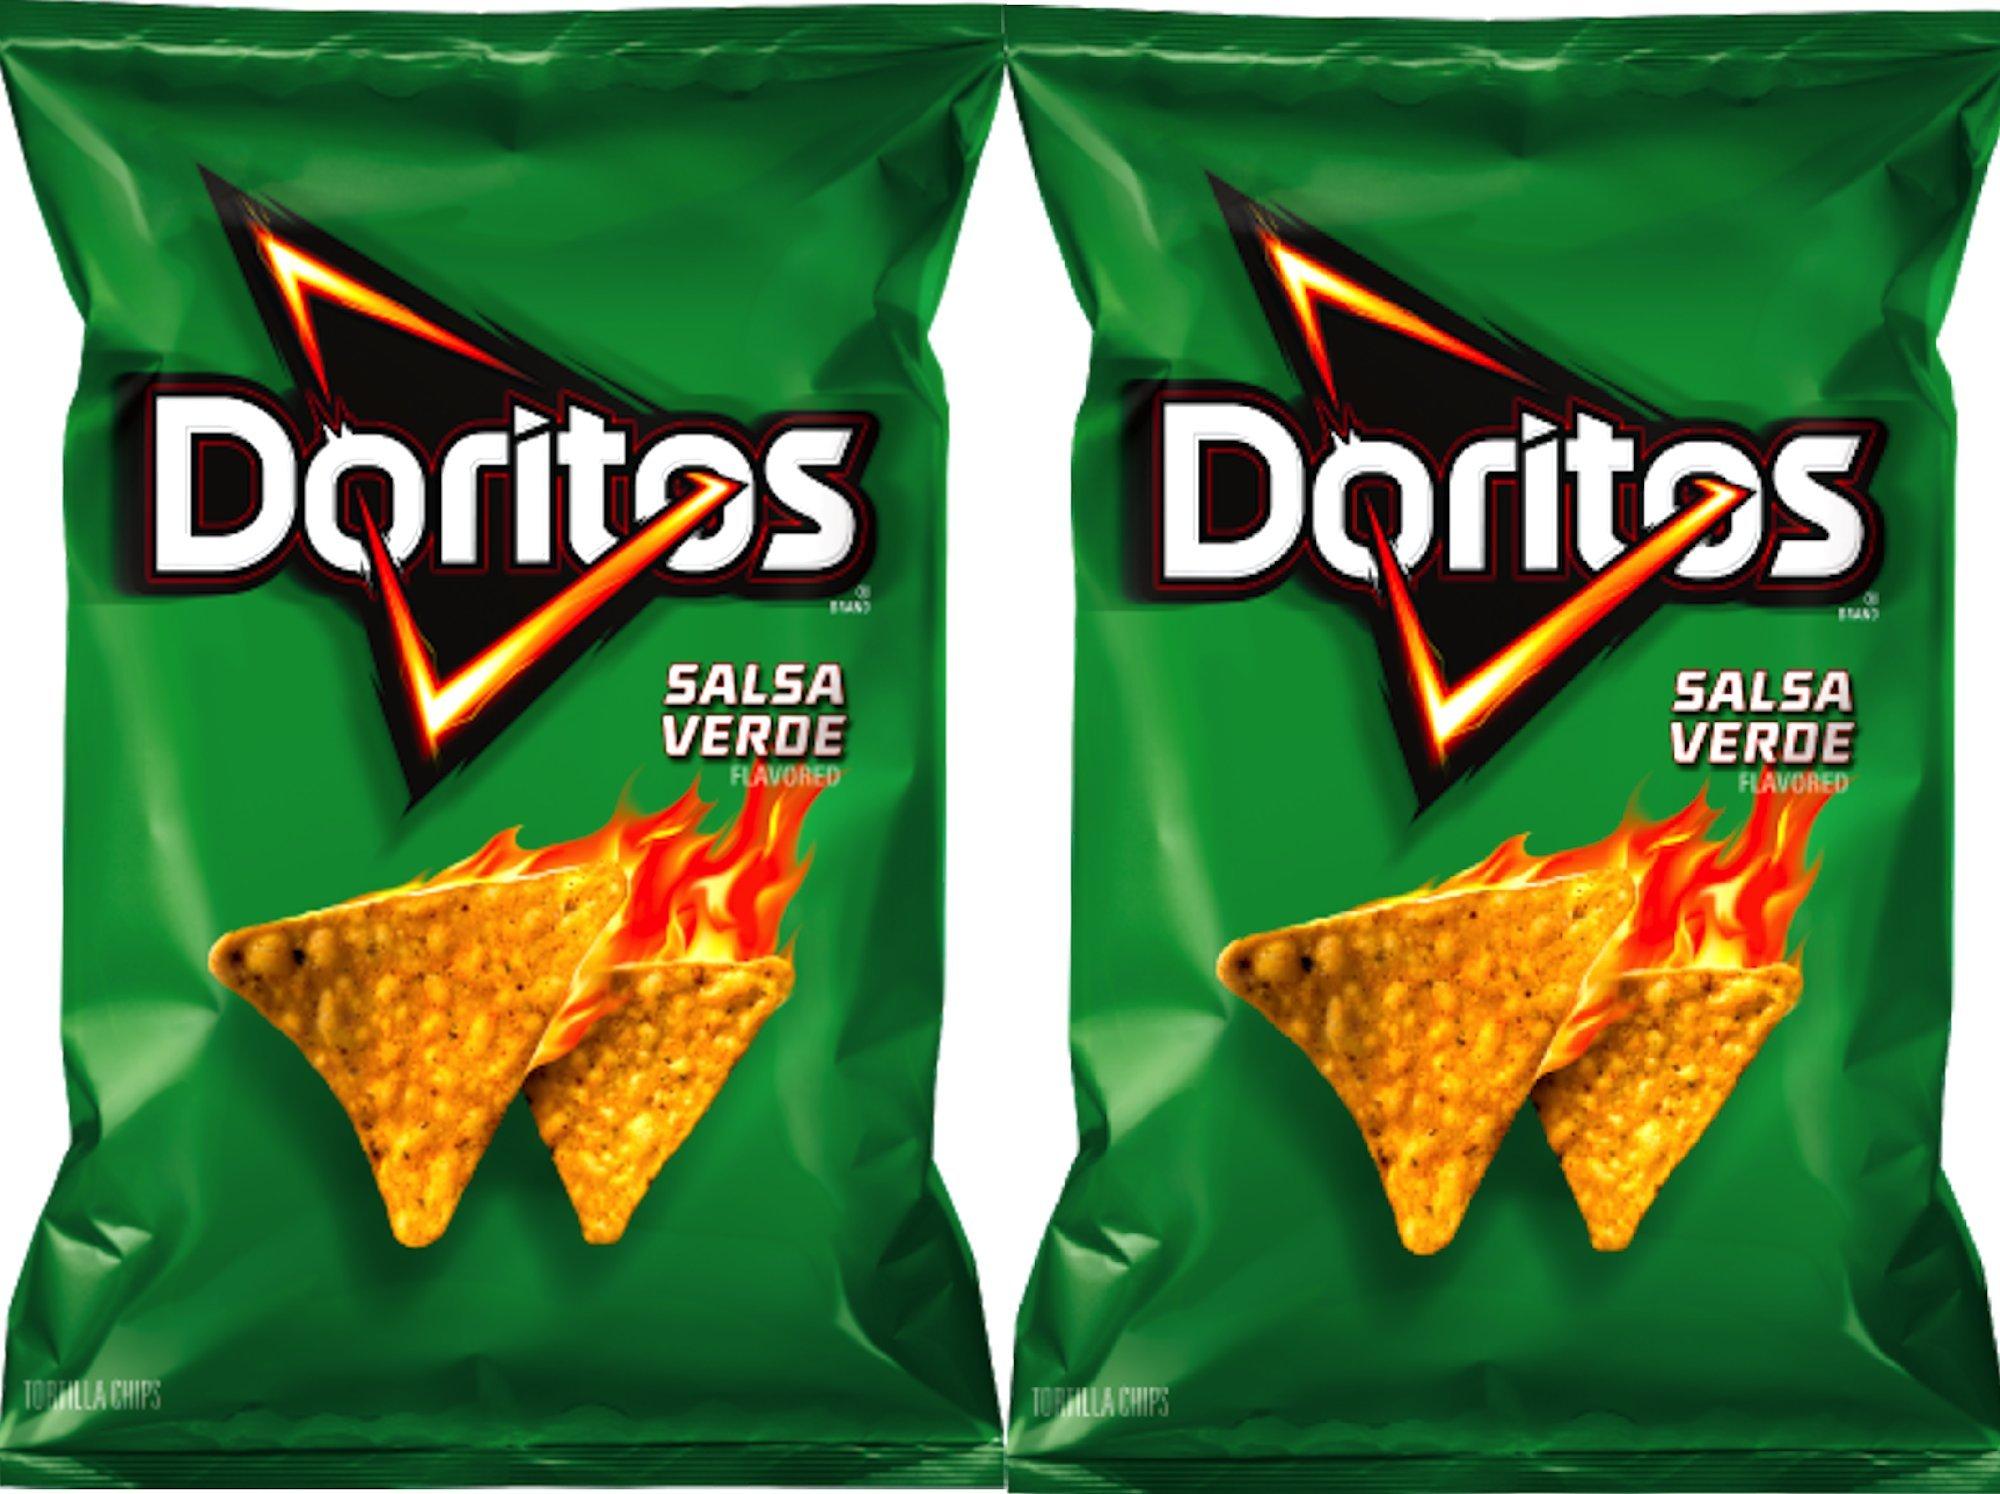 Doritos Salsa verde Flavored Tortilla Chips 10 oz Bags (2)